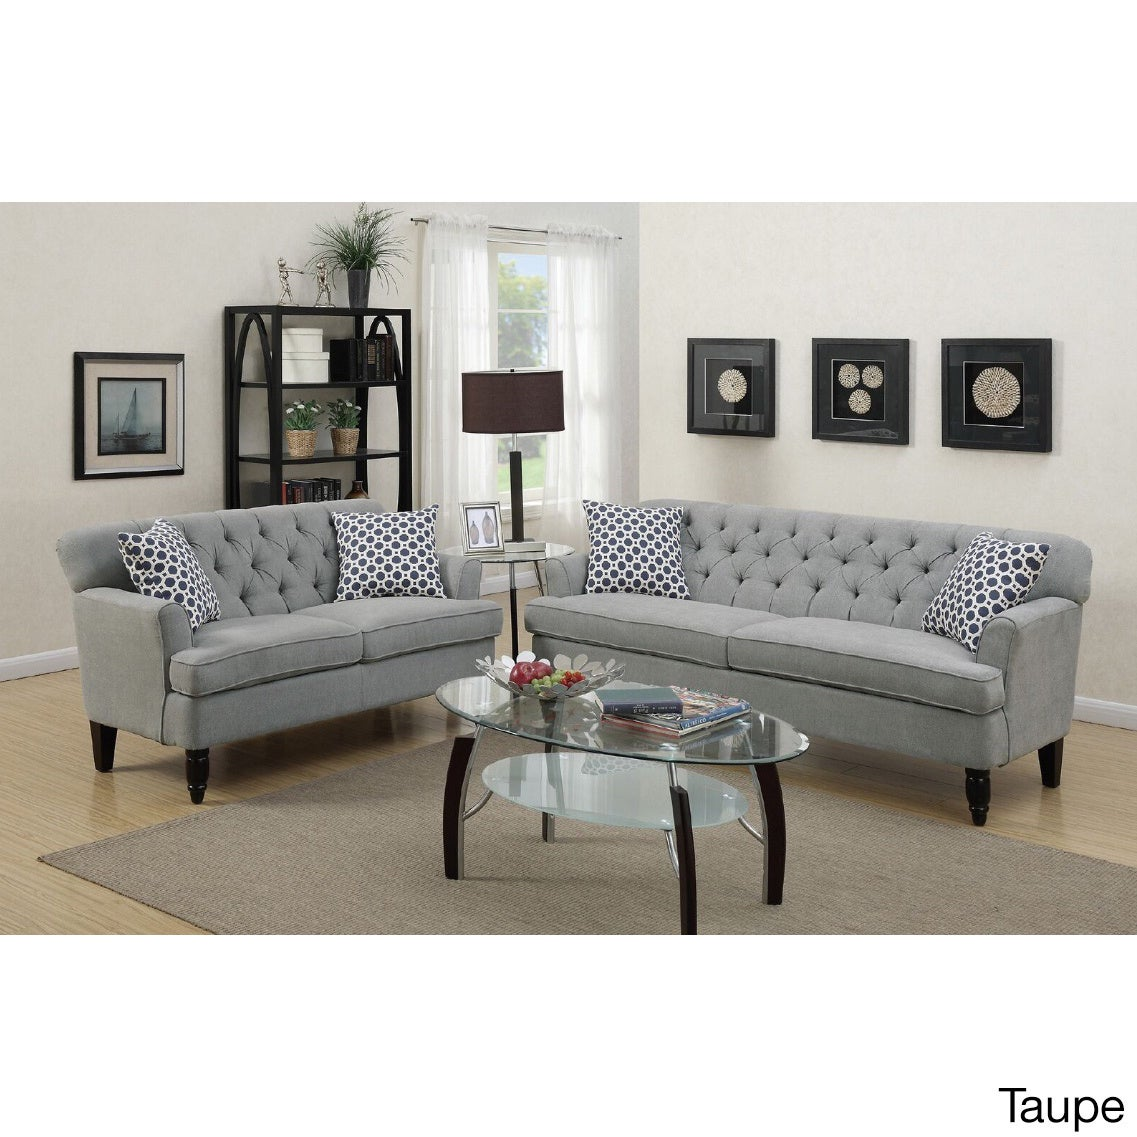 Taupe Living Room Furniture Sets For